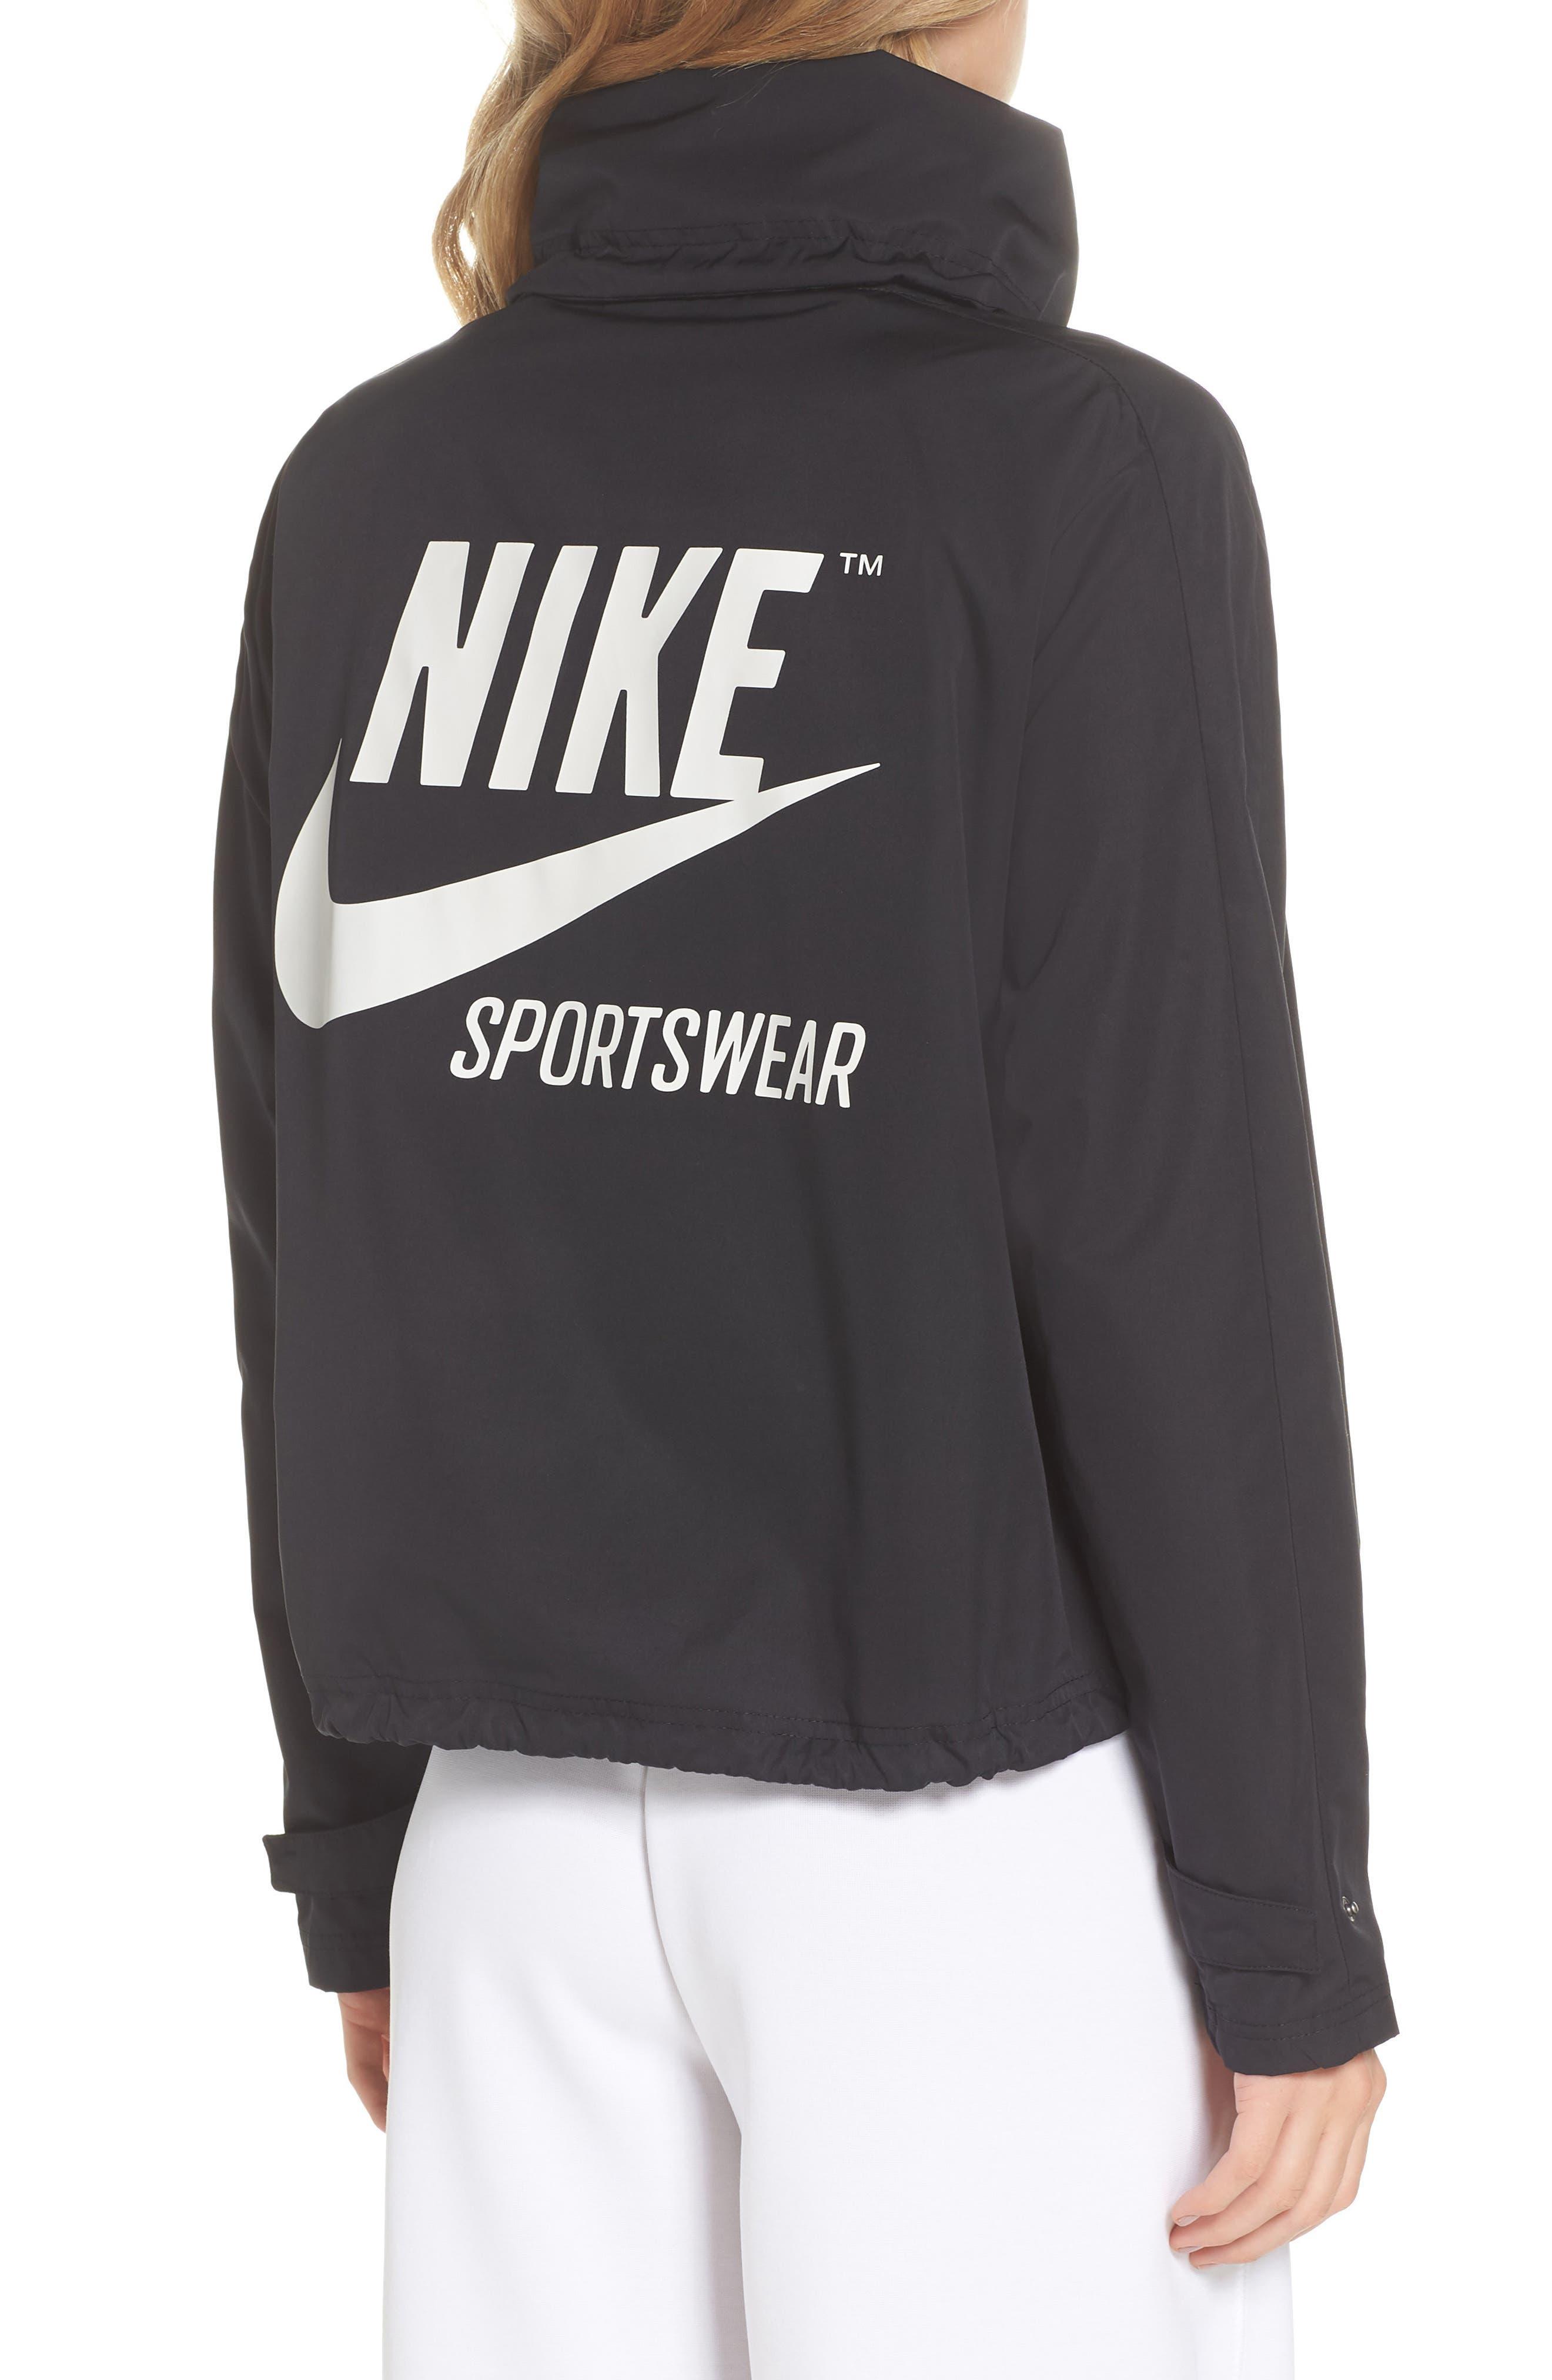 Sportswear Archive Jacket,                             Alternate thumbnail 2, color,                             Black/ Black